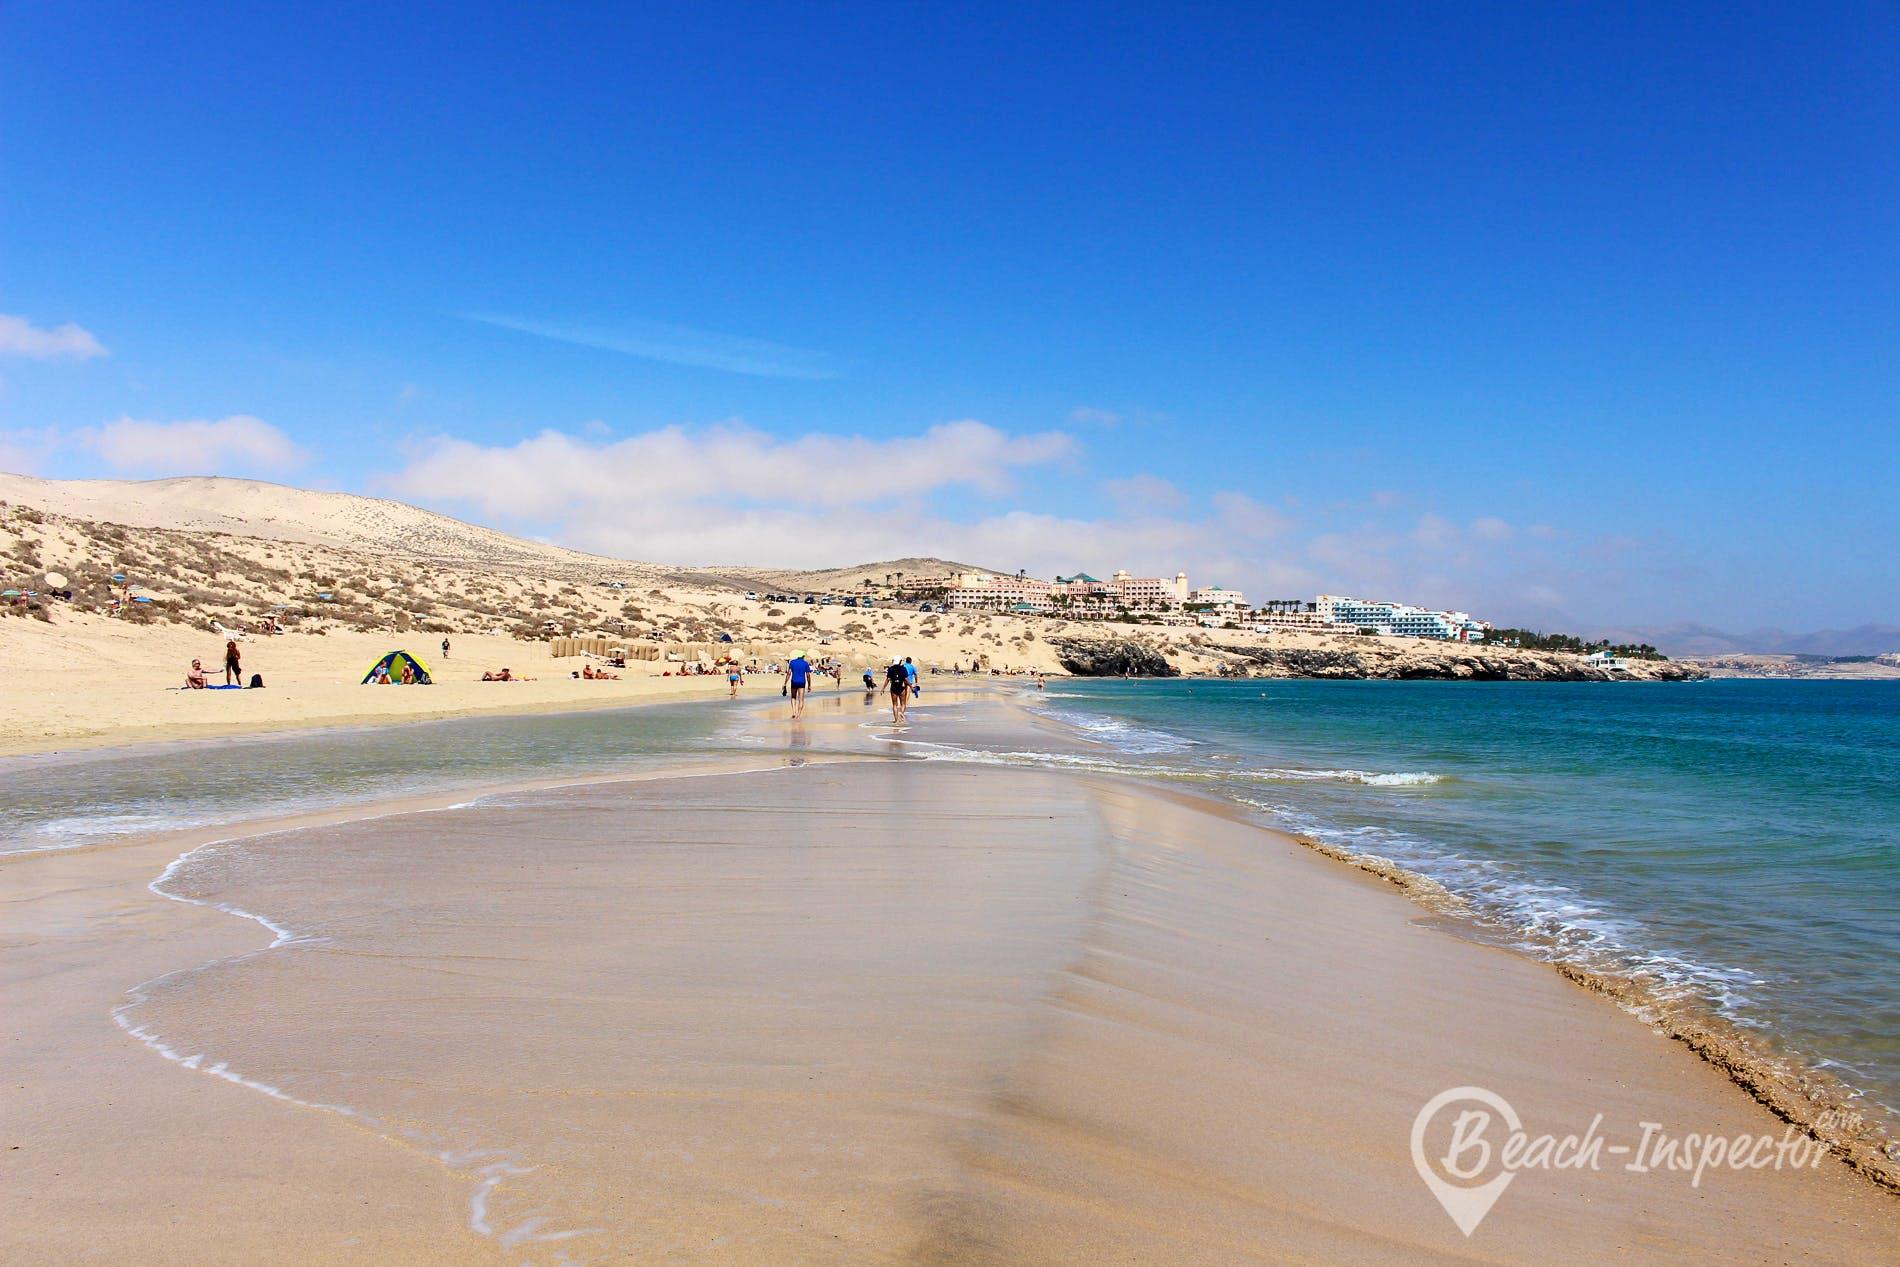 Beach Playa Esmeralda South, Fuerteventura, Spain